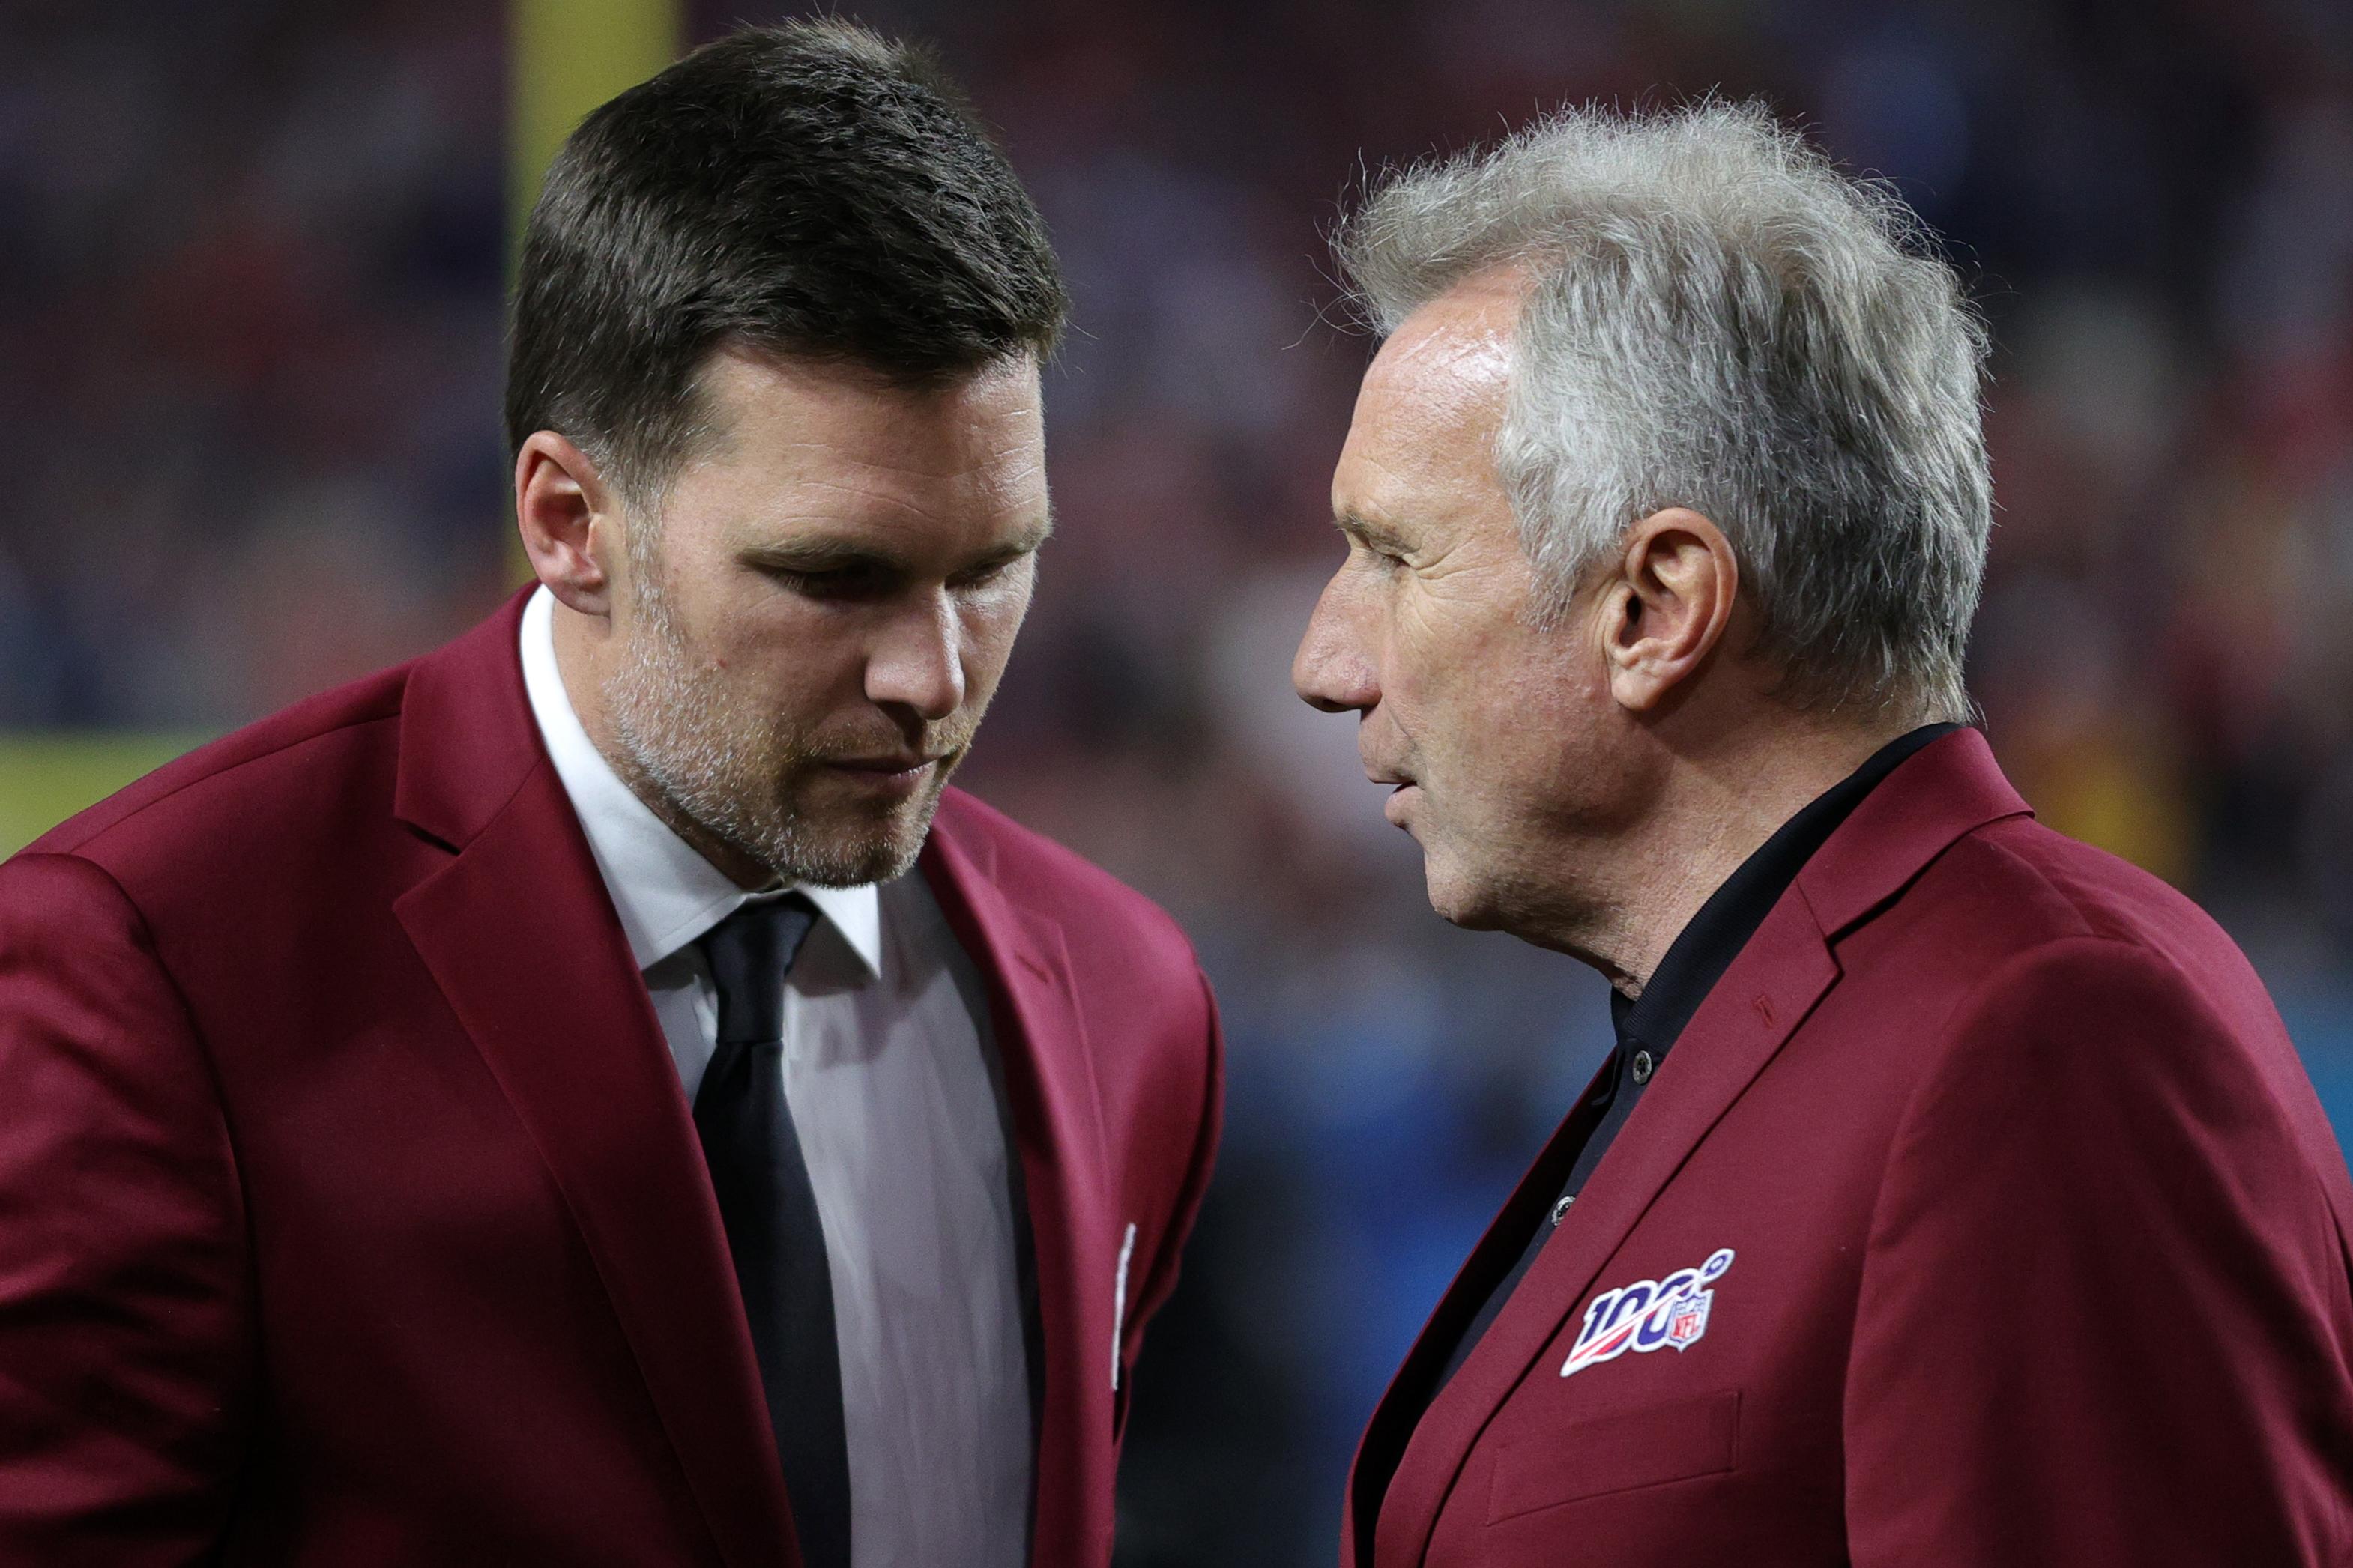 Joe Montana Says Tom Brady S Patriots Exit Was A Mistake